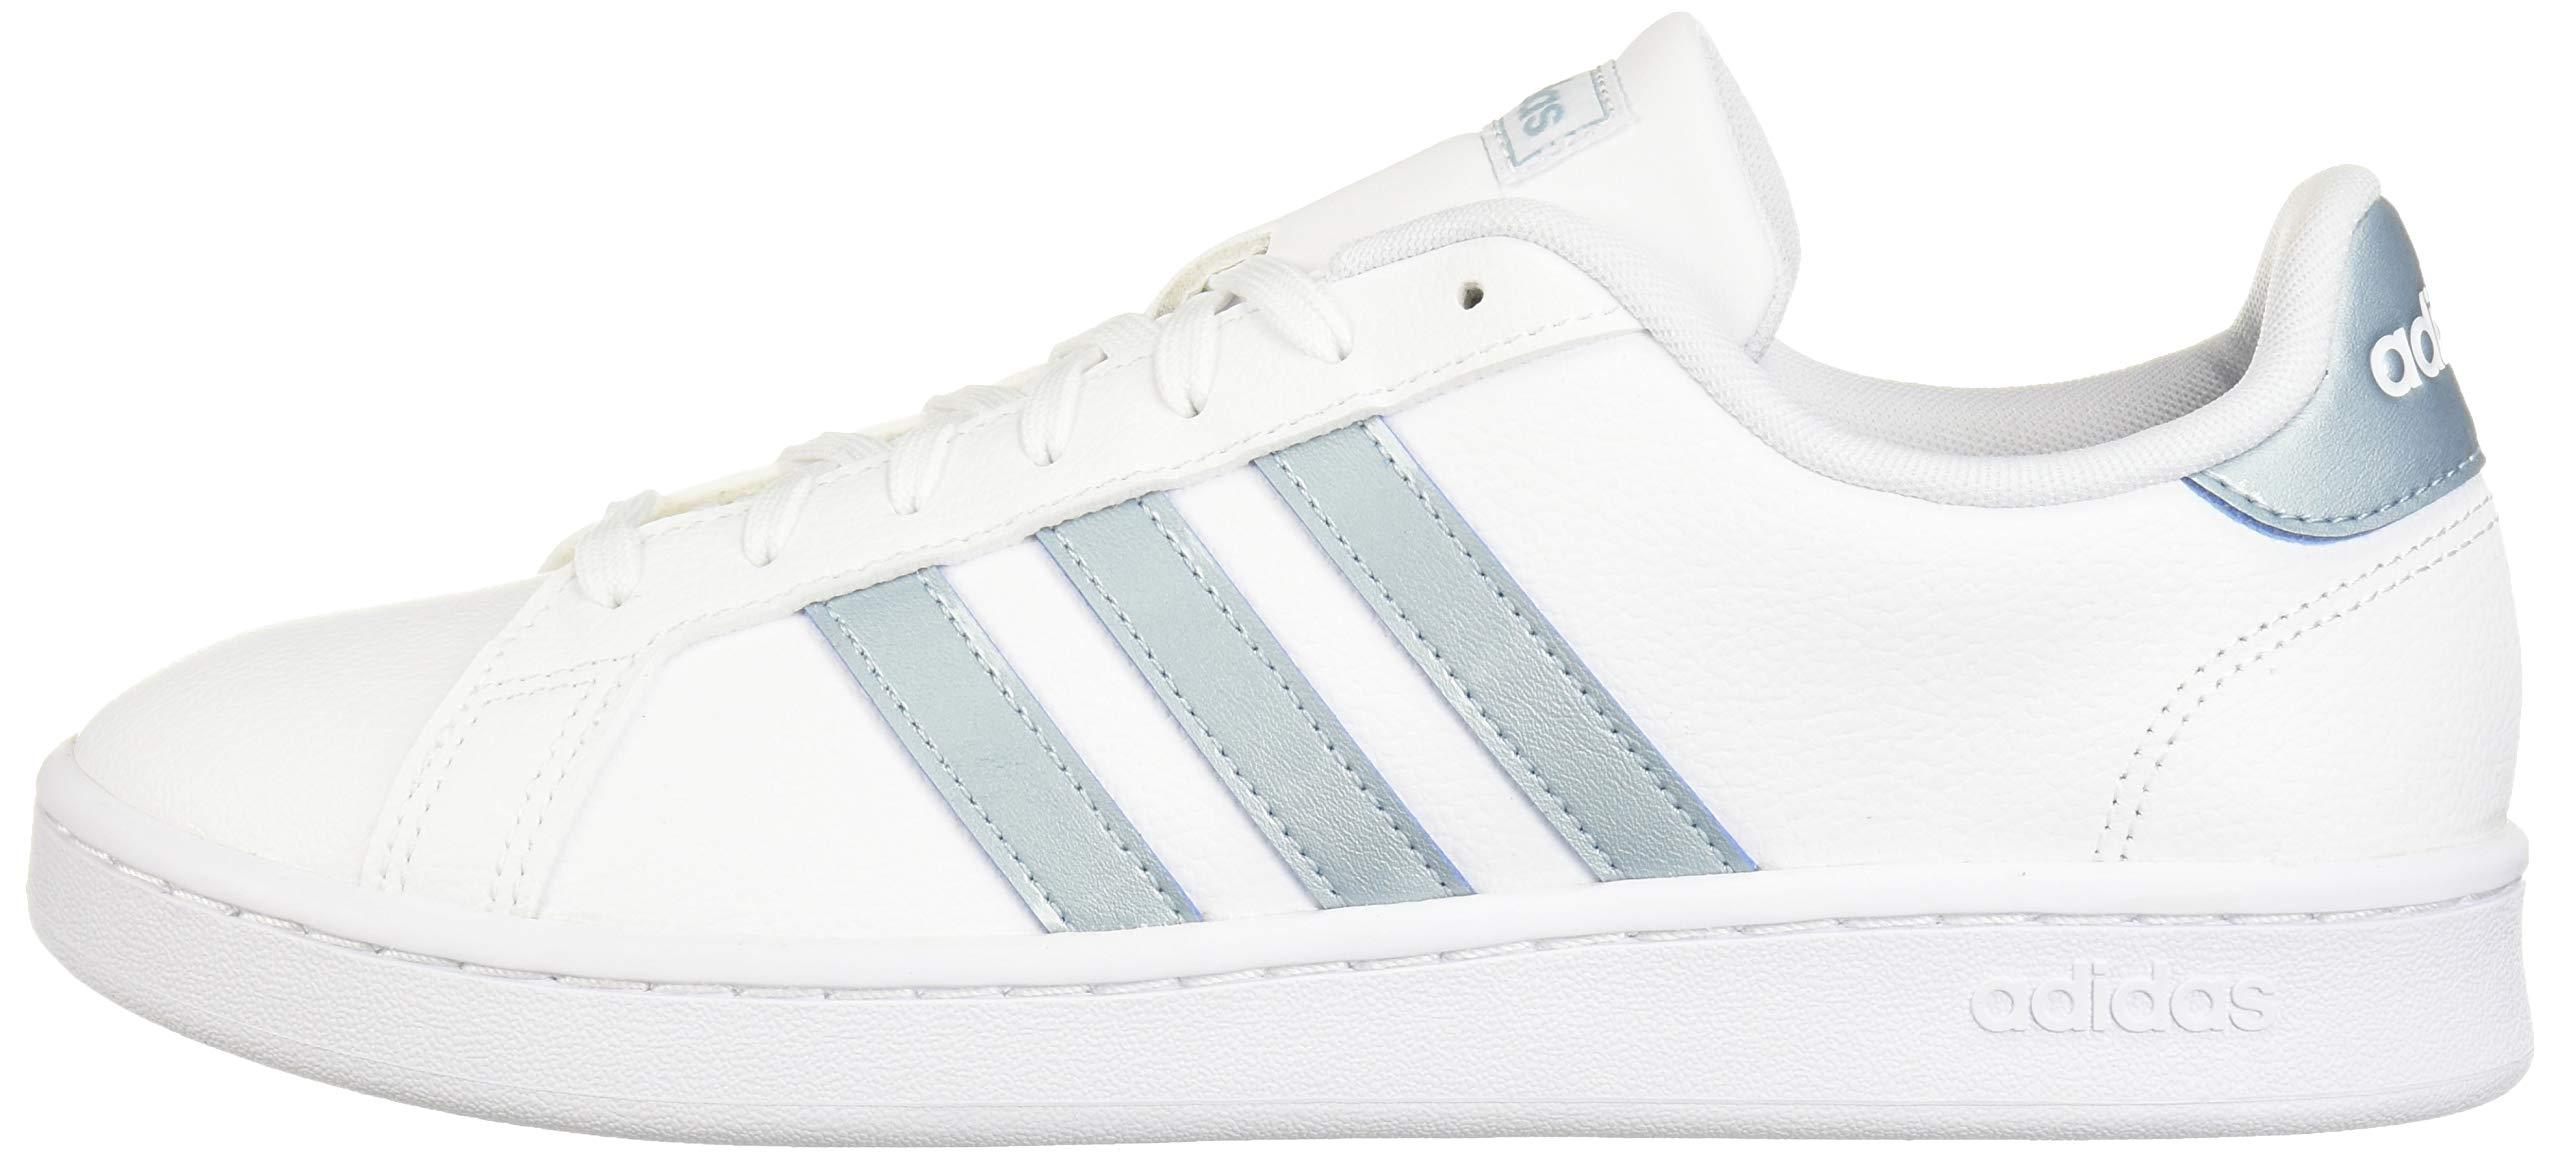 adidas Women's Grand Court Sneaker, White/ash Grey/light granite, 9 M US